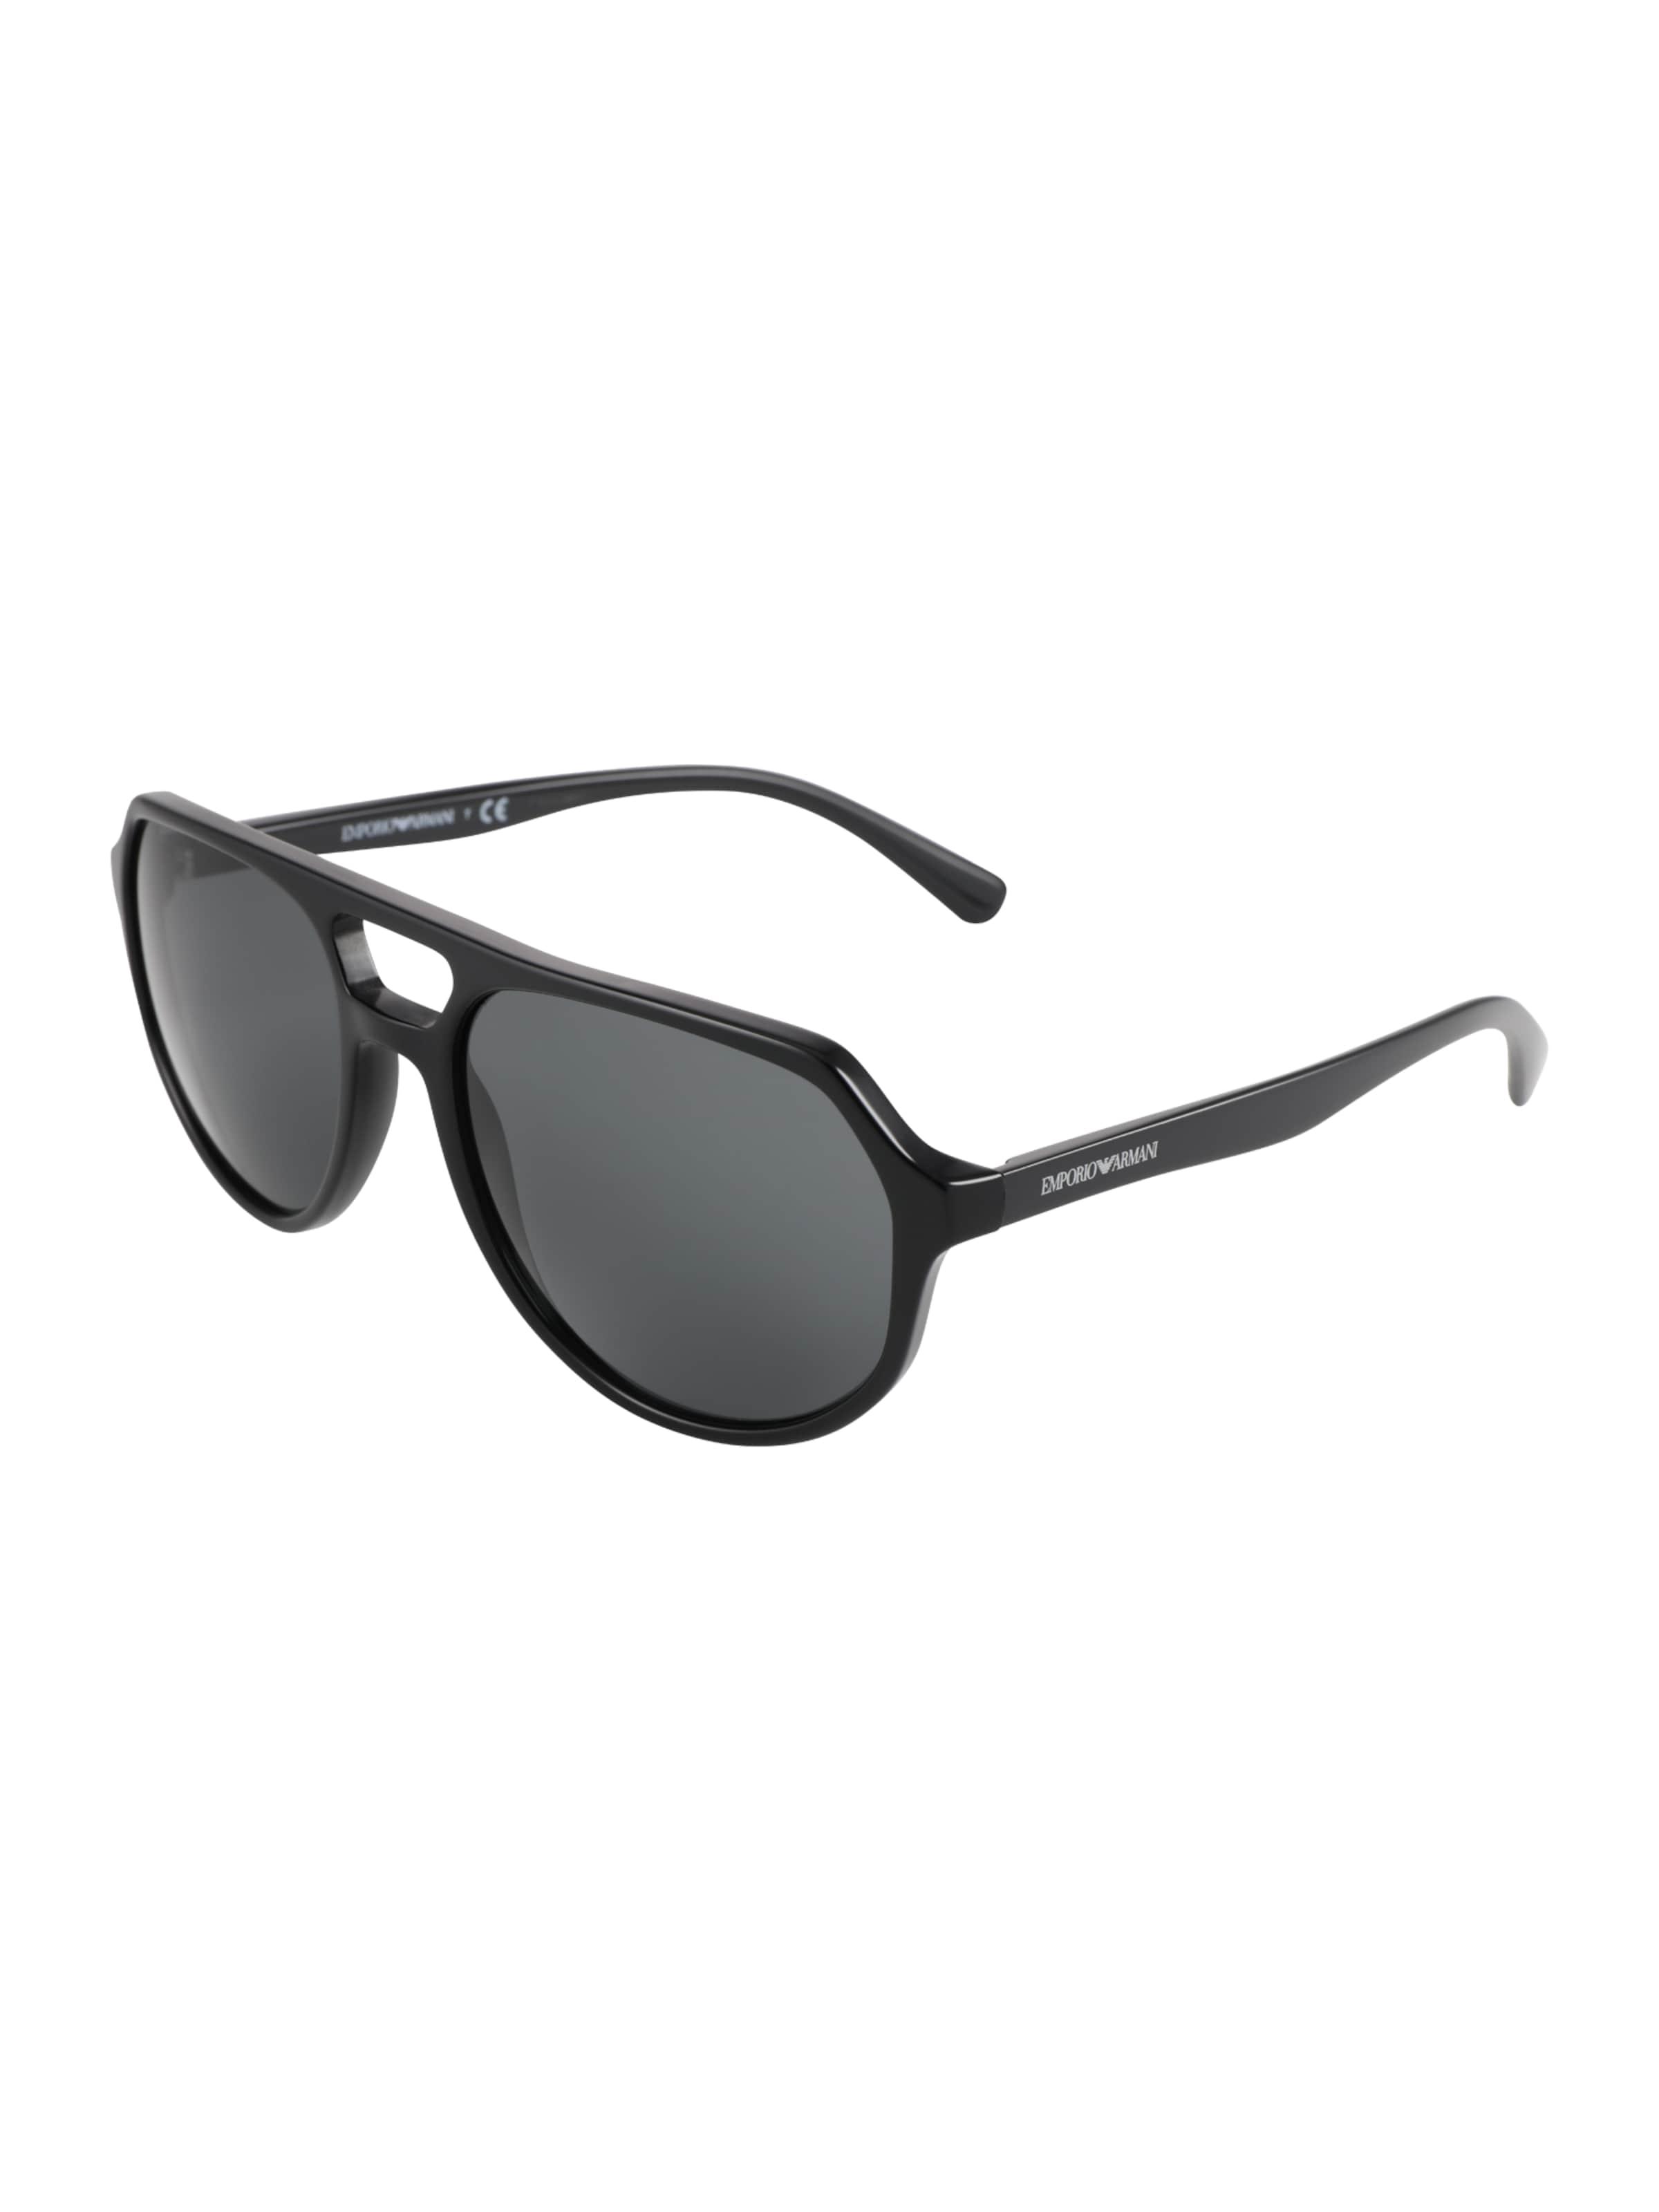 Schwarz In Armani Emporio Emporio Sonnenbrille nwP80Ok